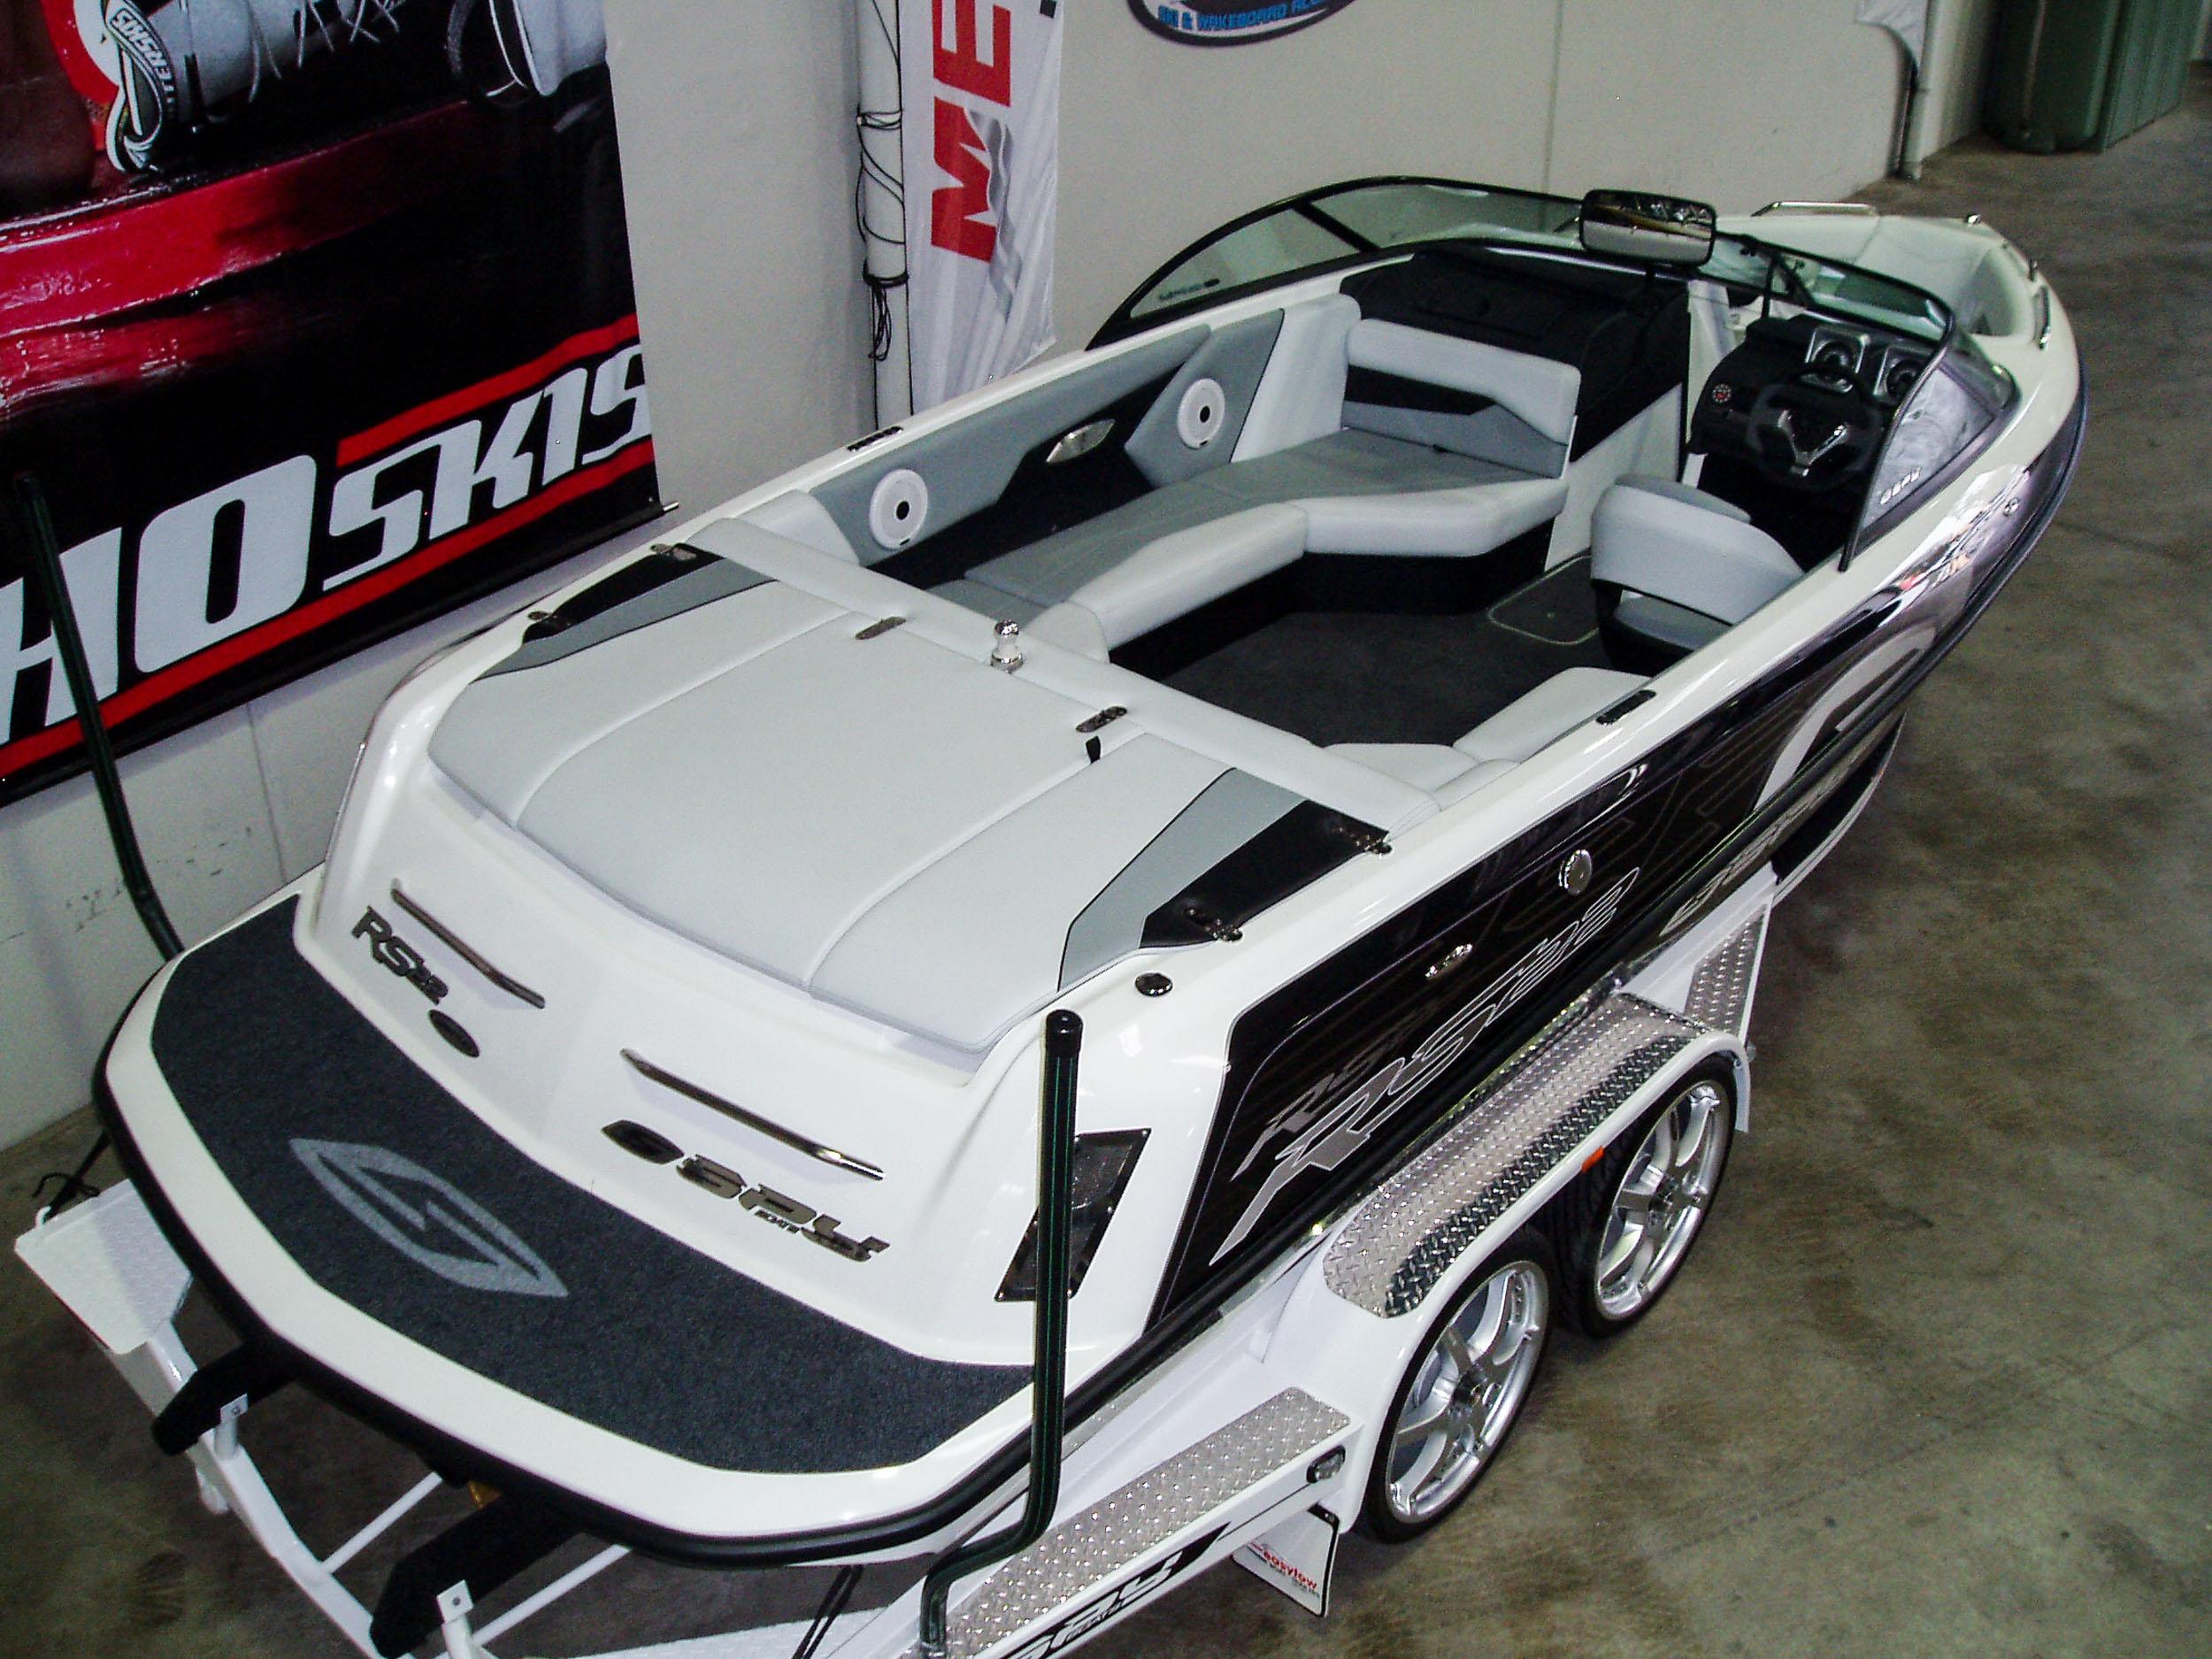 Spy_Boats_RS22-20.jpg